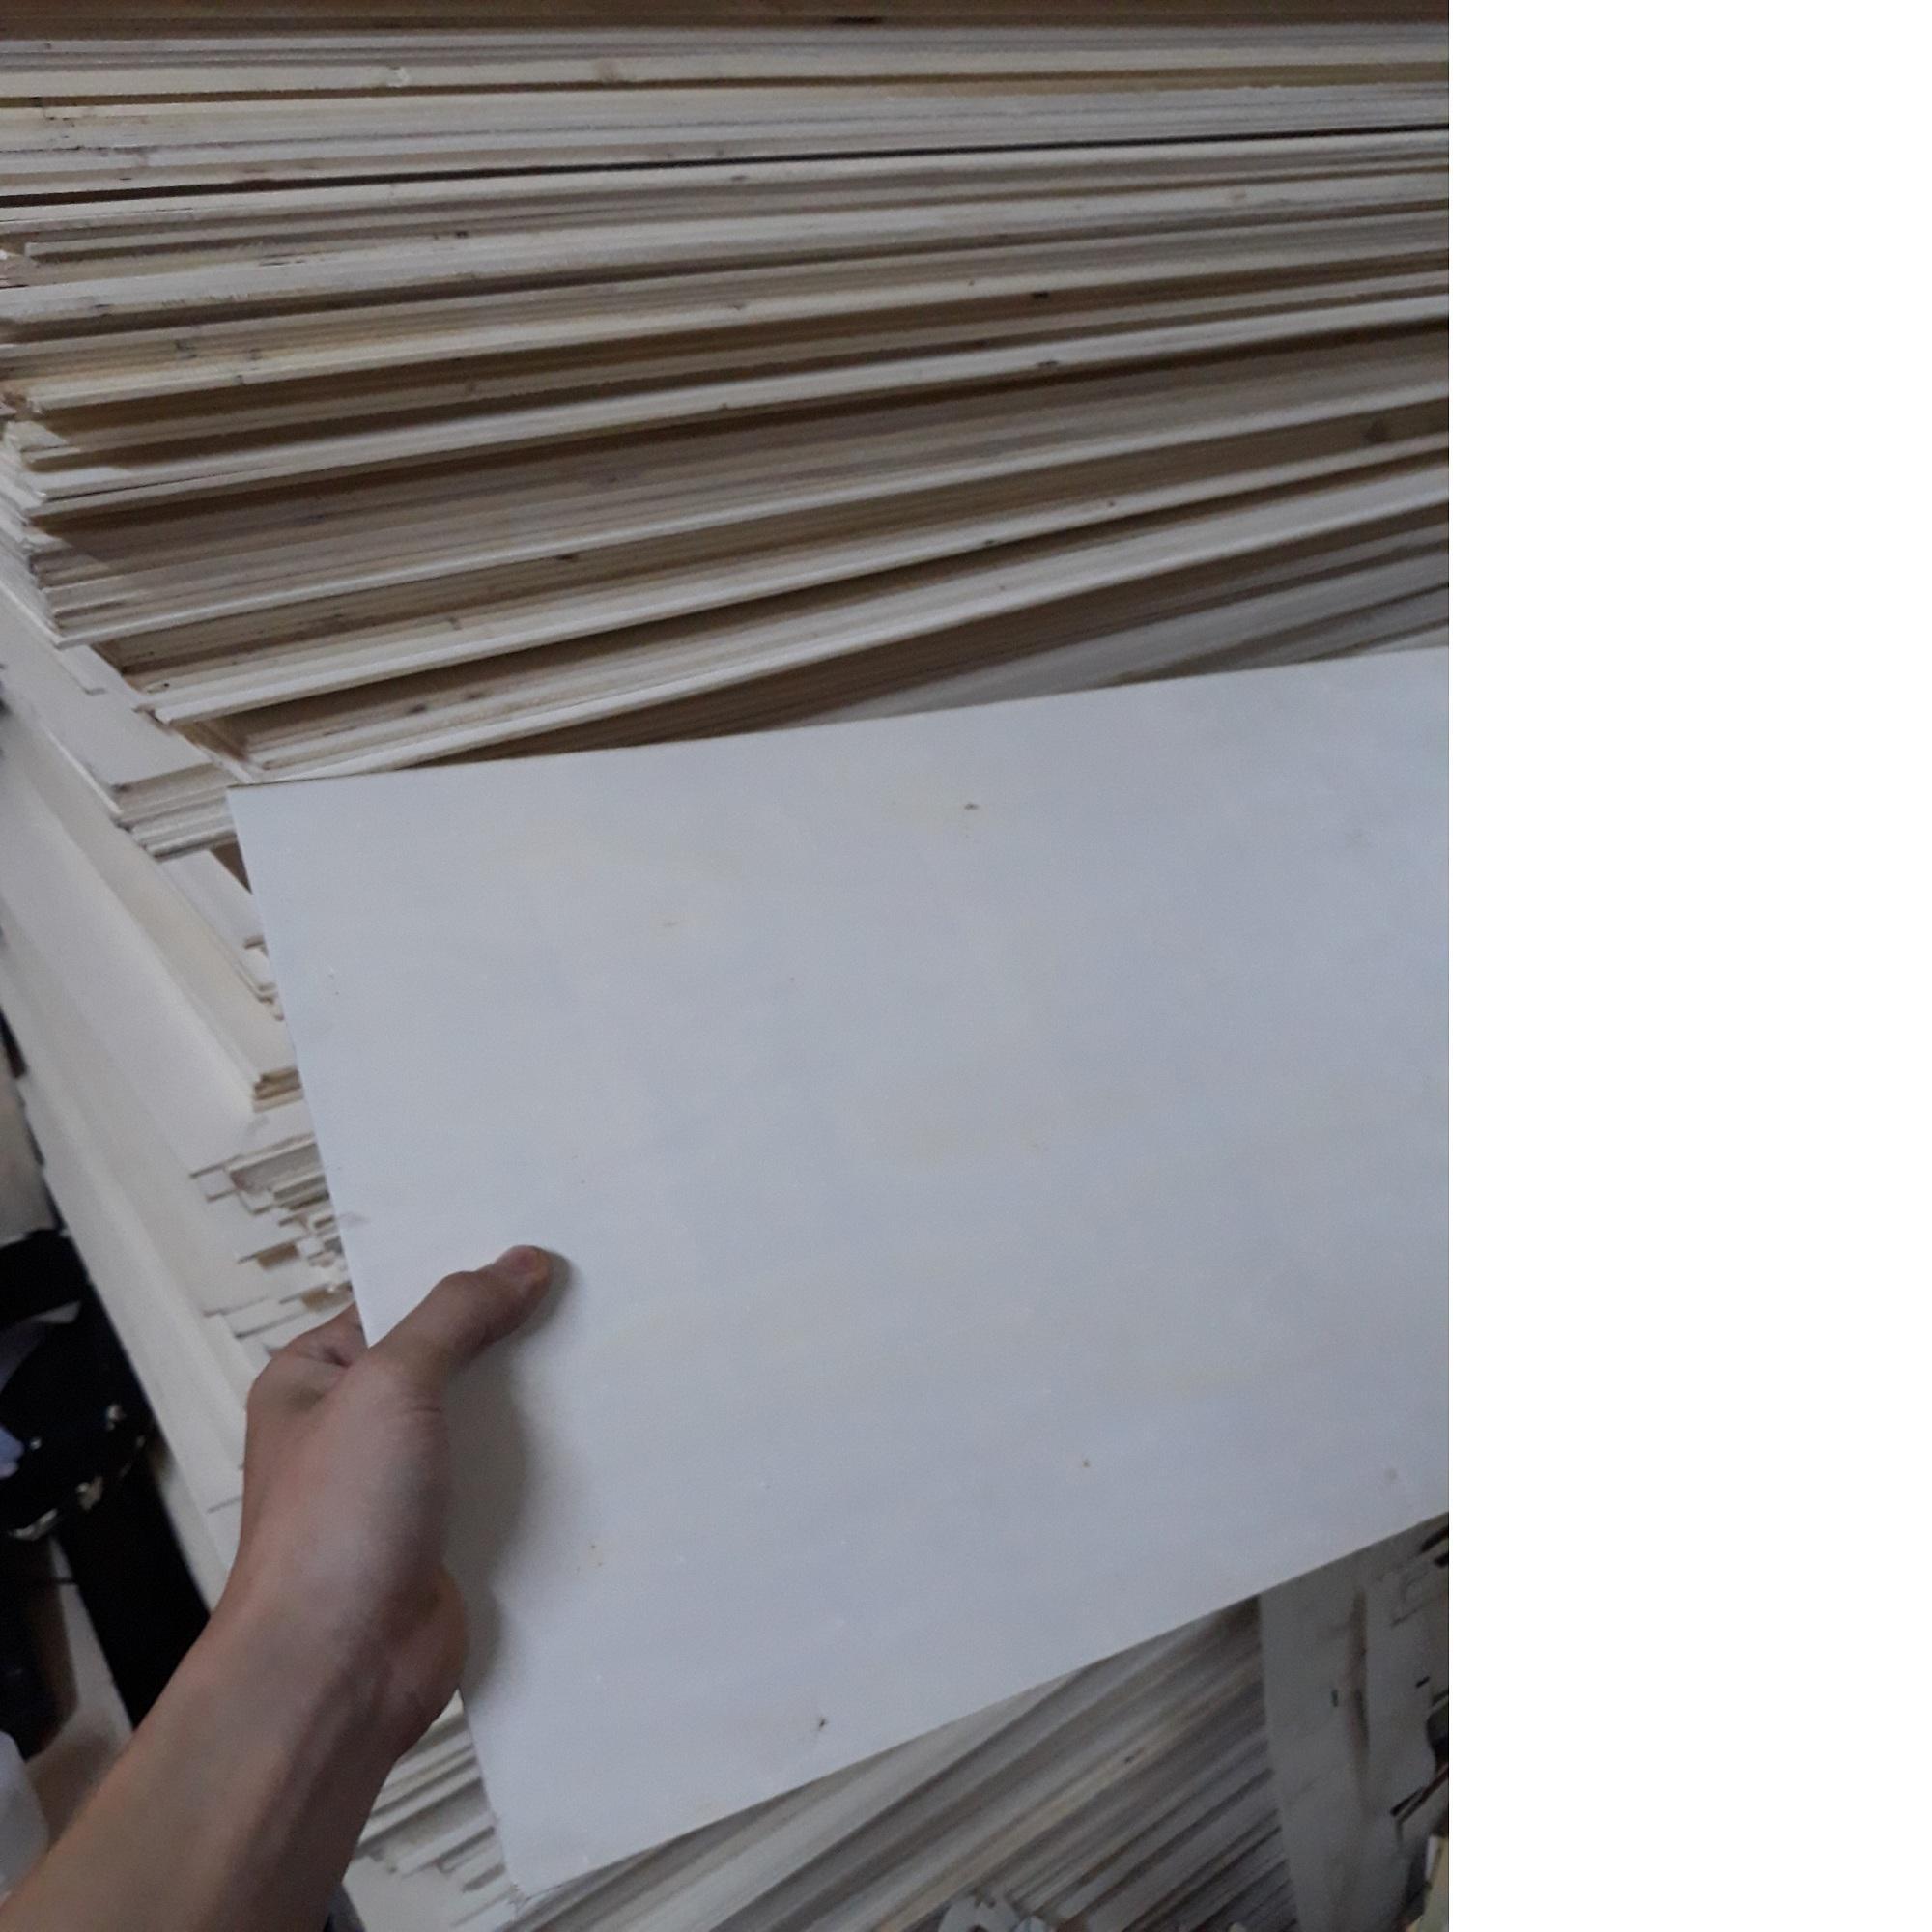 Mua Gỗ diy gỗ trắng 2 mặt 2 tấm 300x600x3mm